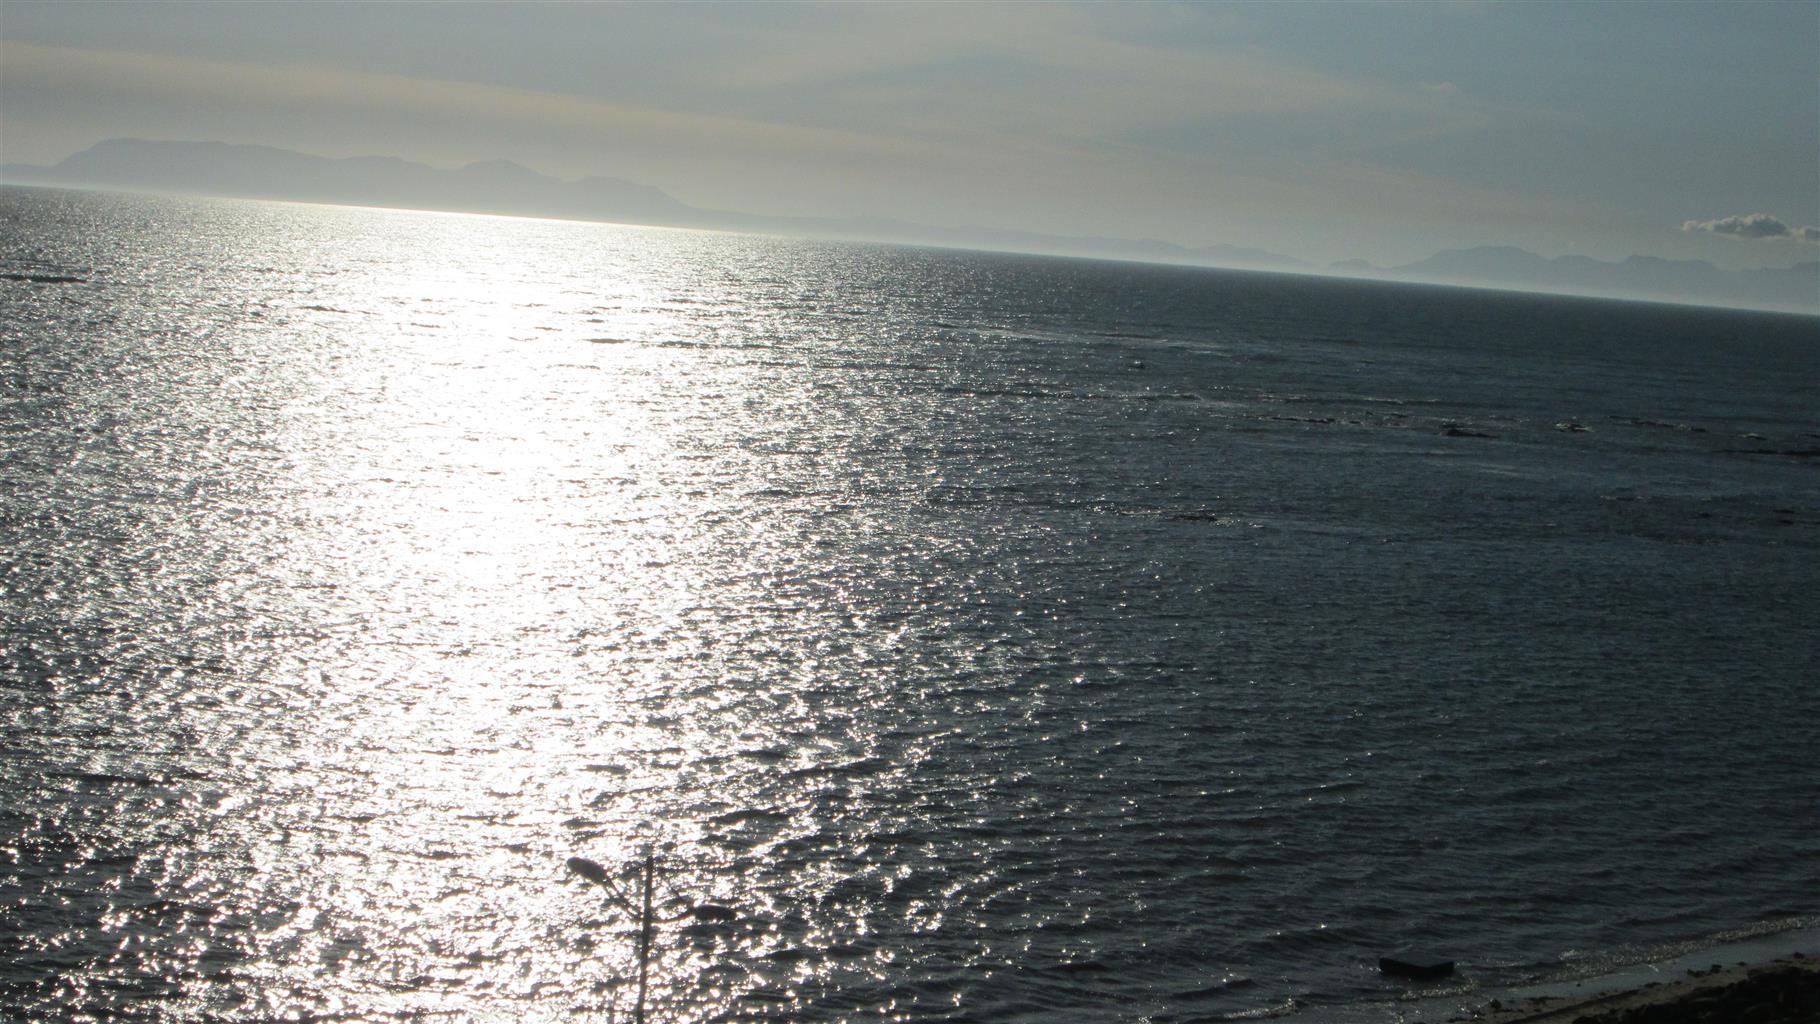 BEACH FRONT STRAND